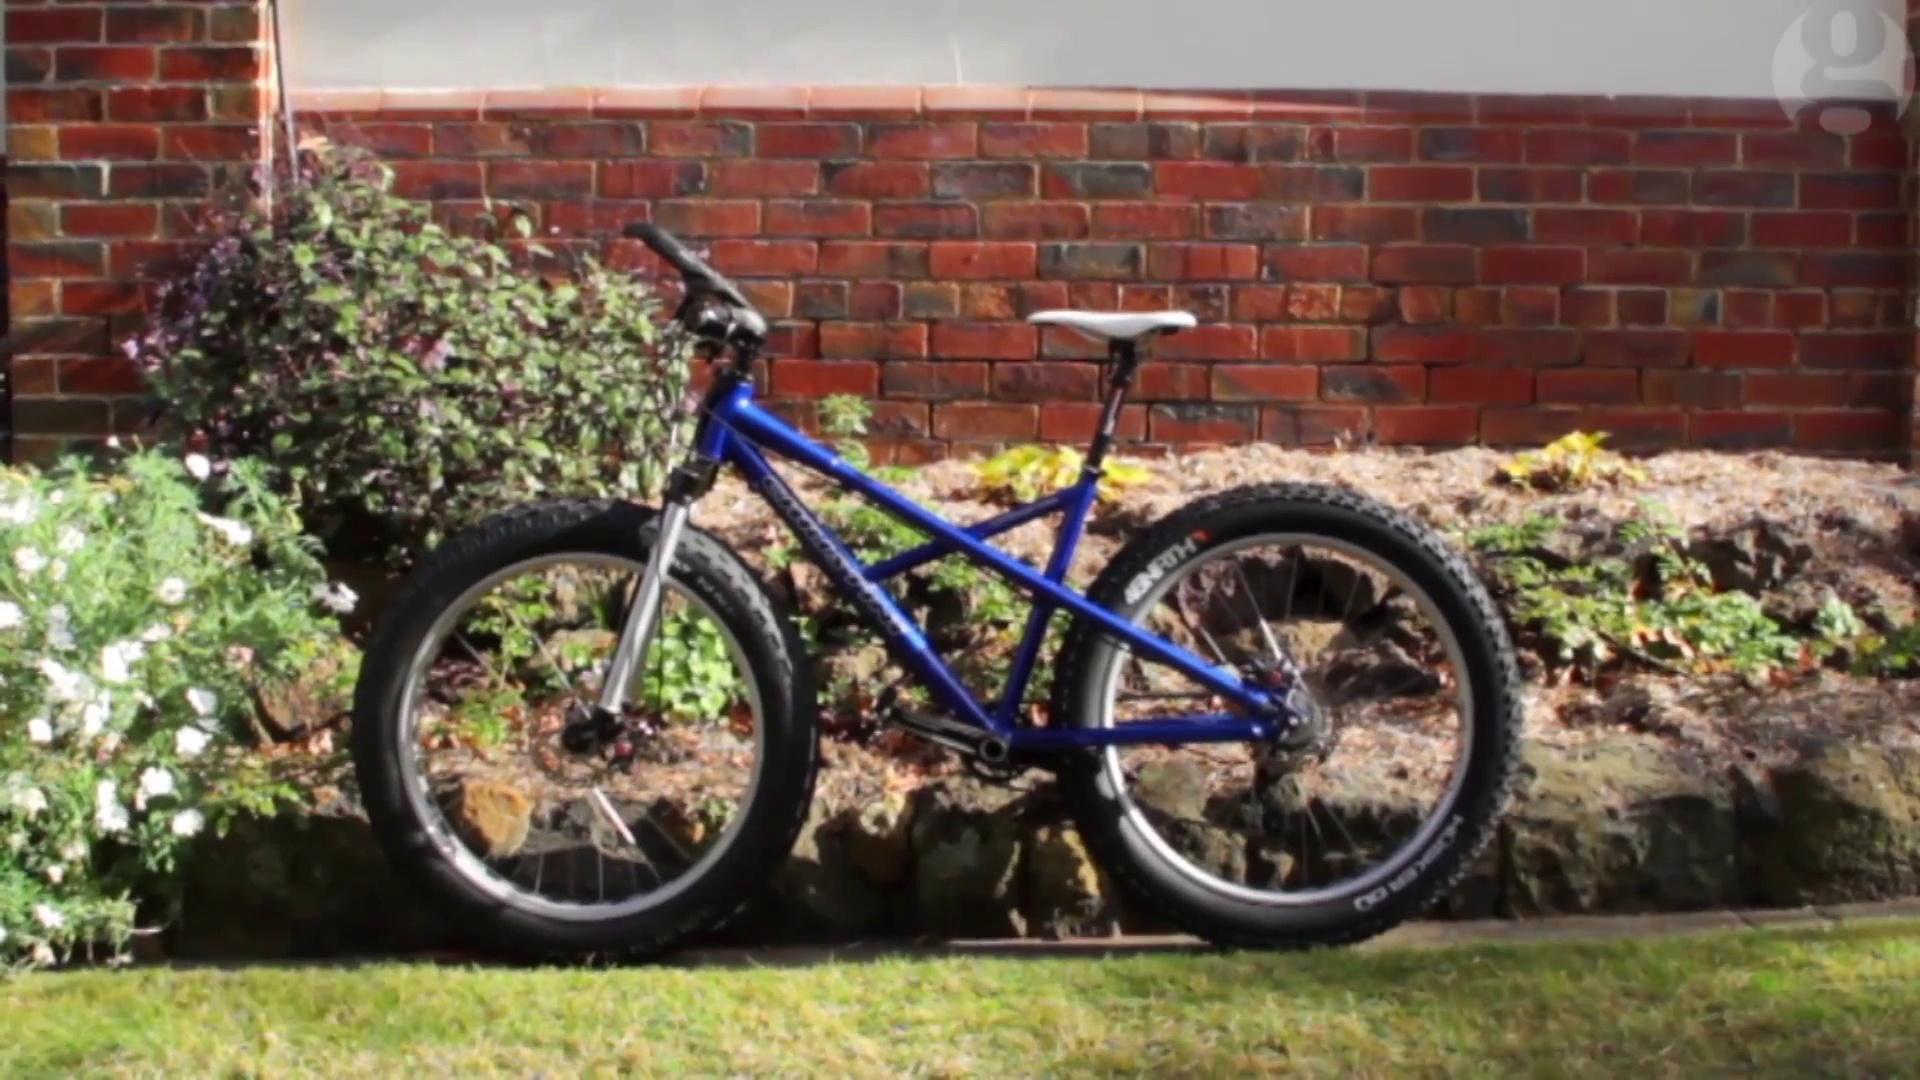 Woman plans ride across Antarctica on custom bike with large tires – Kate Leeming